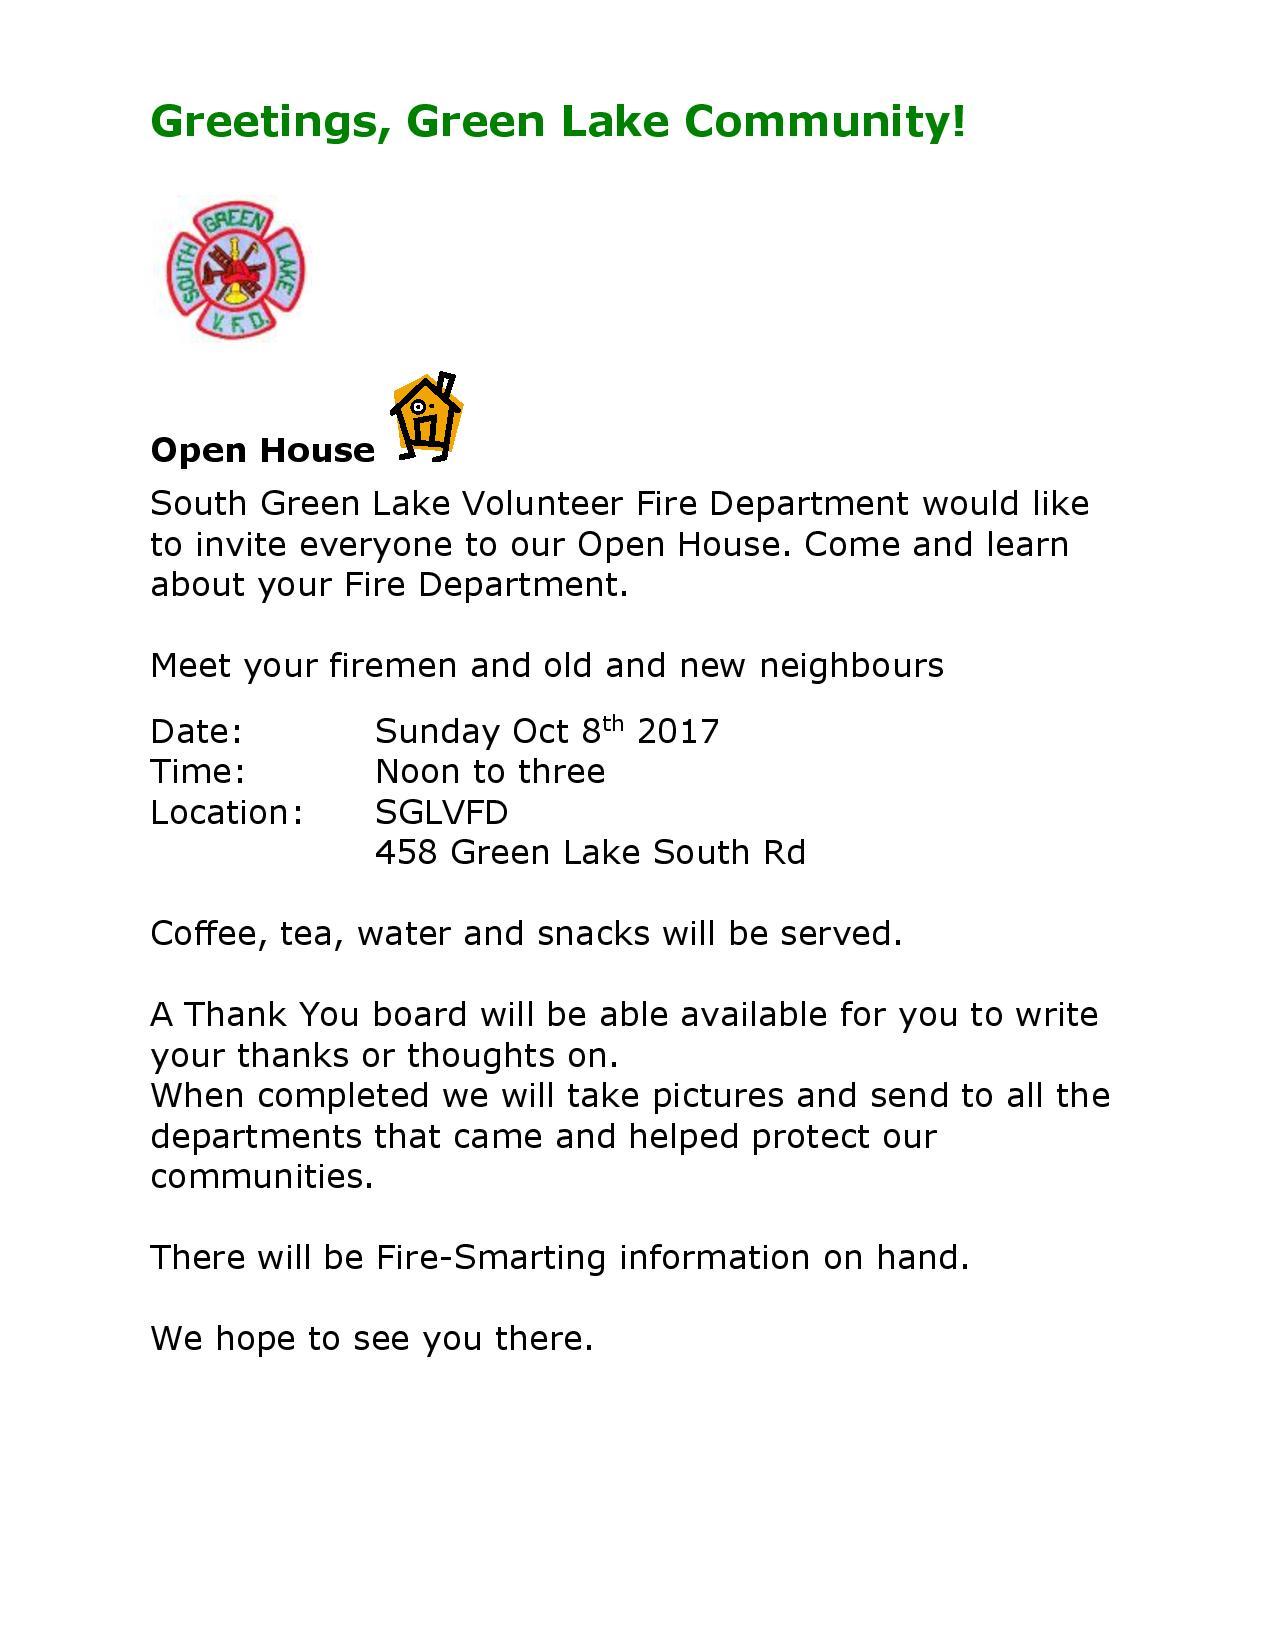 South Green Lake Volunteer Fire Department